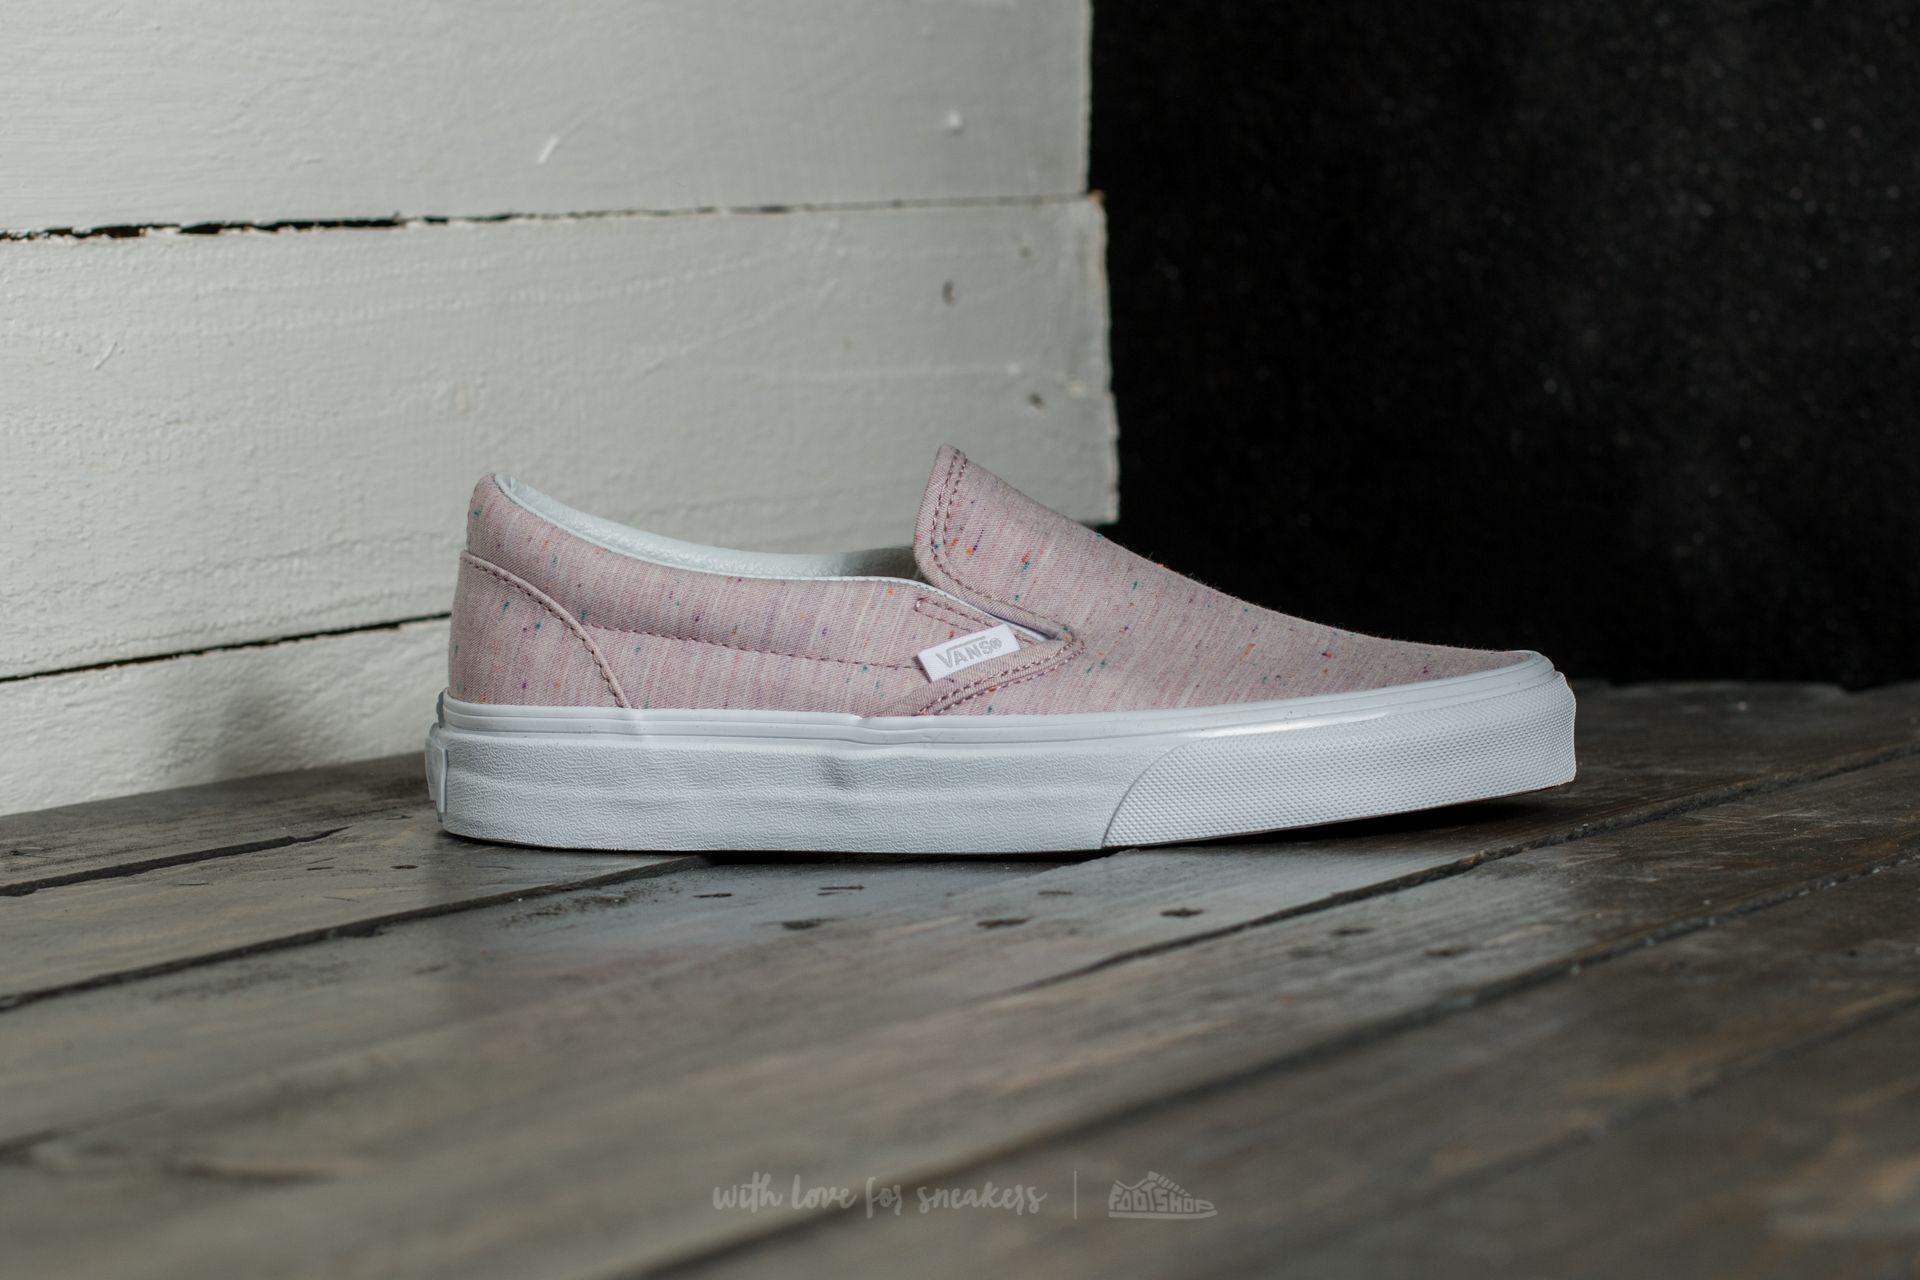 92b584765f1f Lyst - Vans Classic Slip-on (speckle Jersey) Pink  True White